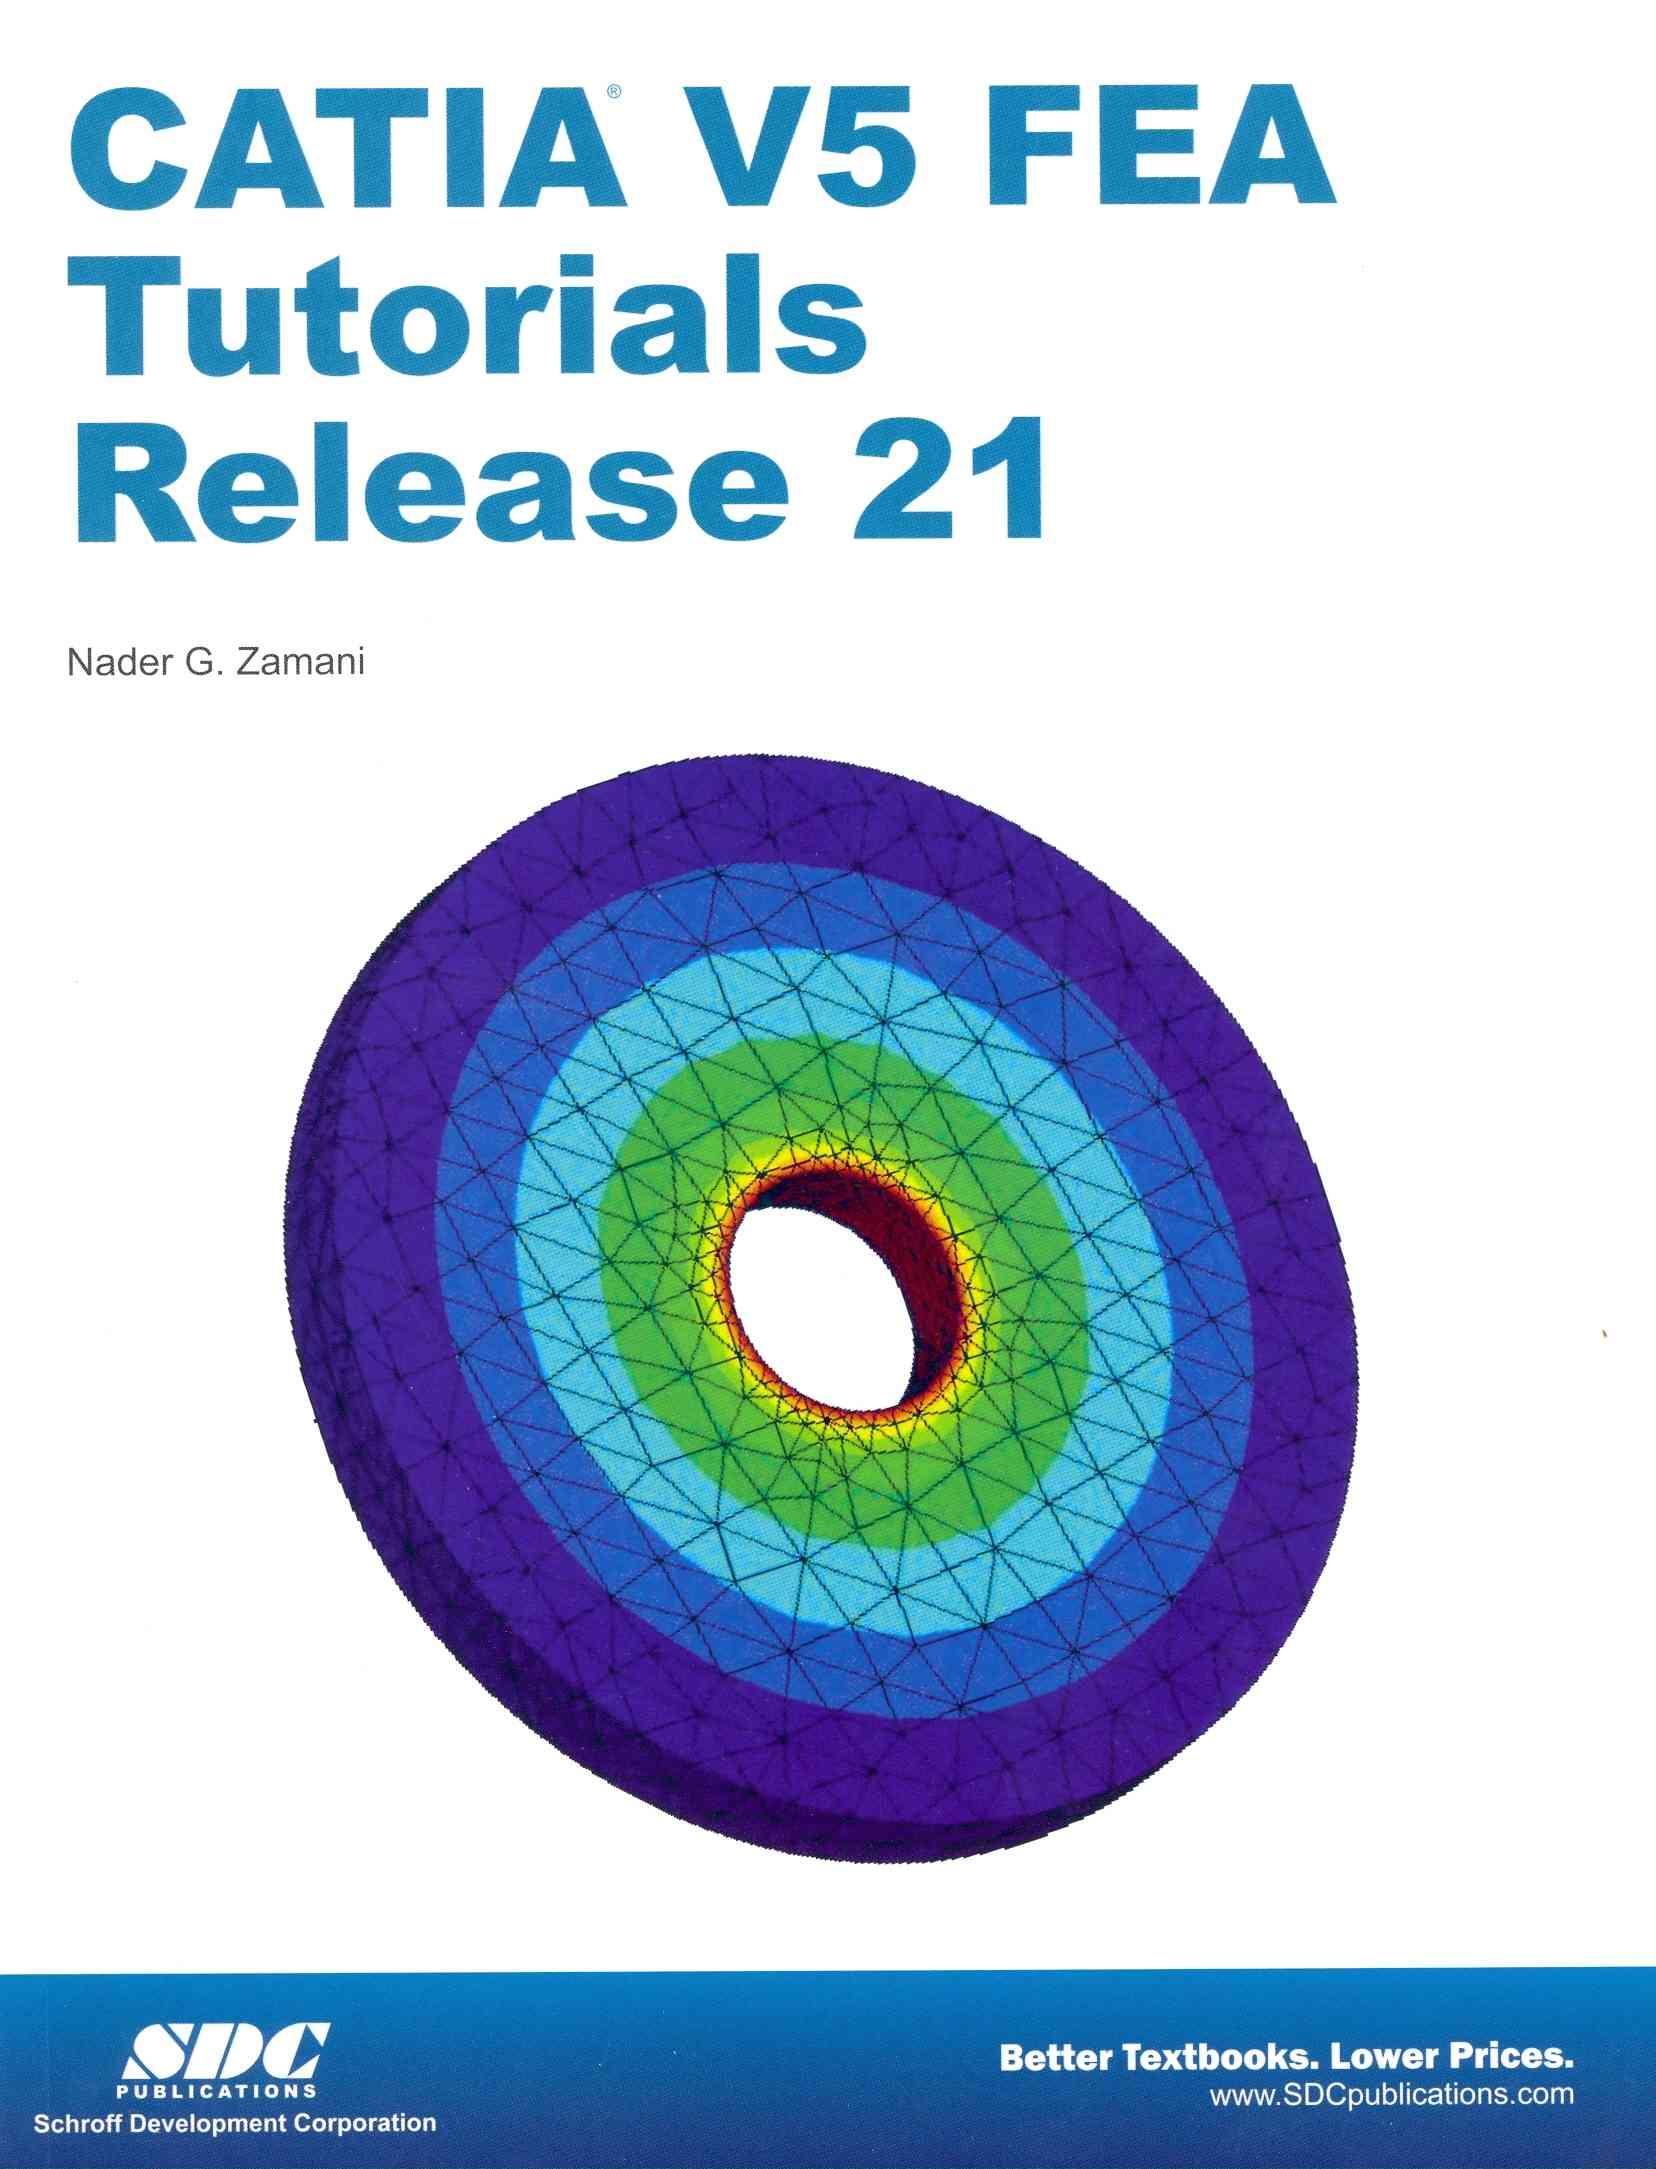 Catia V5 Fea Tutorials Release 21 By Zamani, Nader